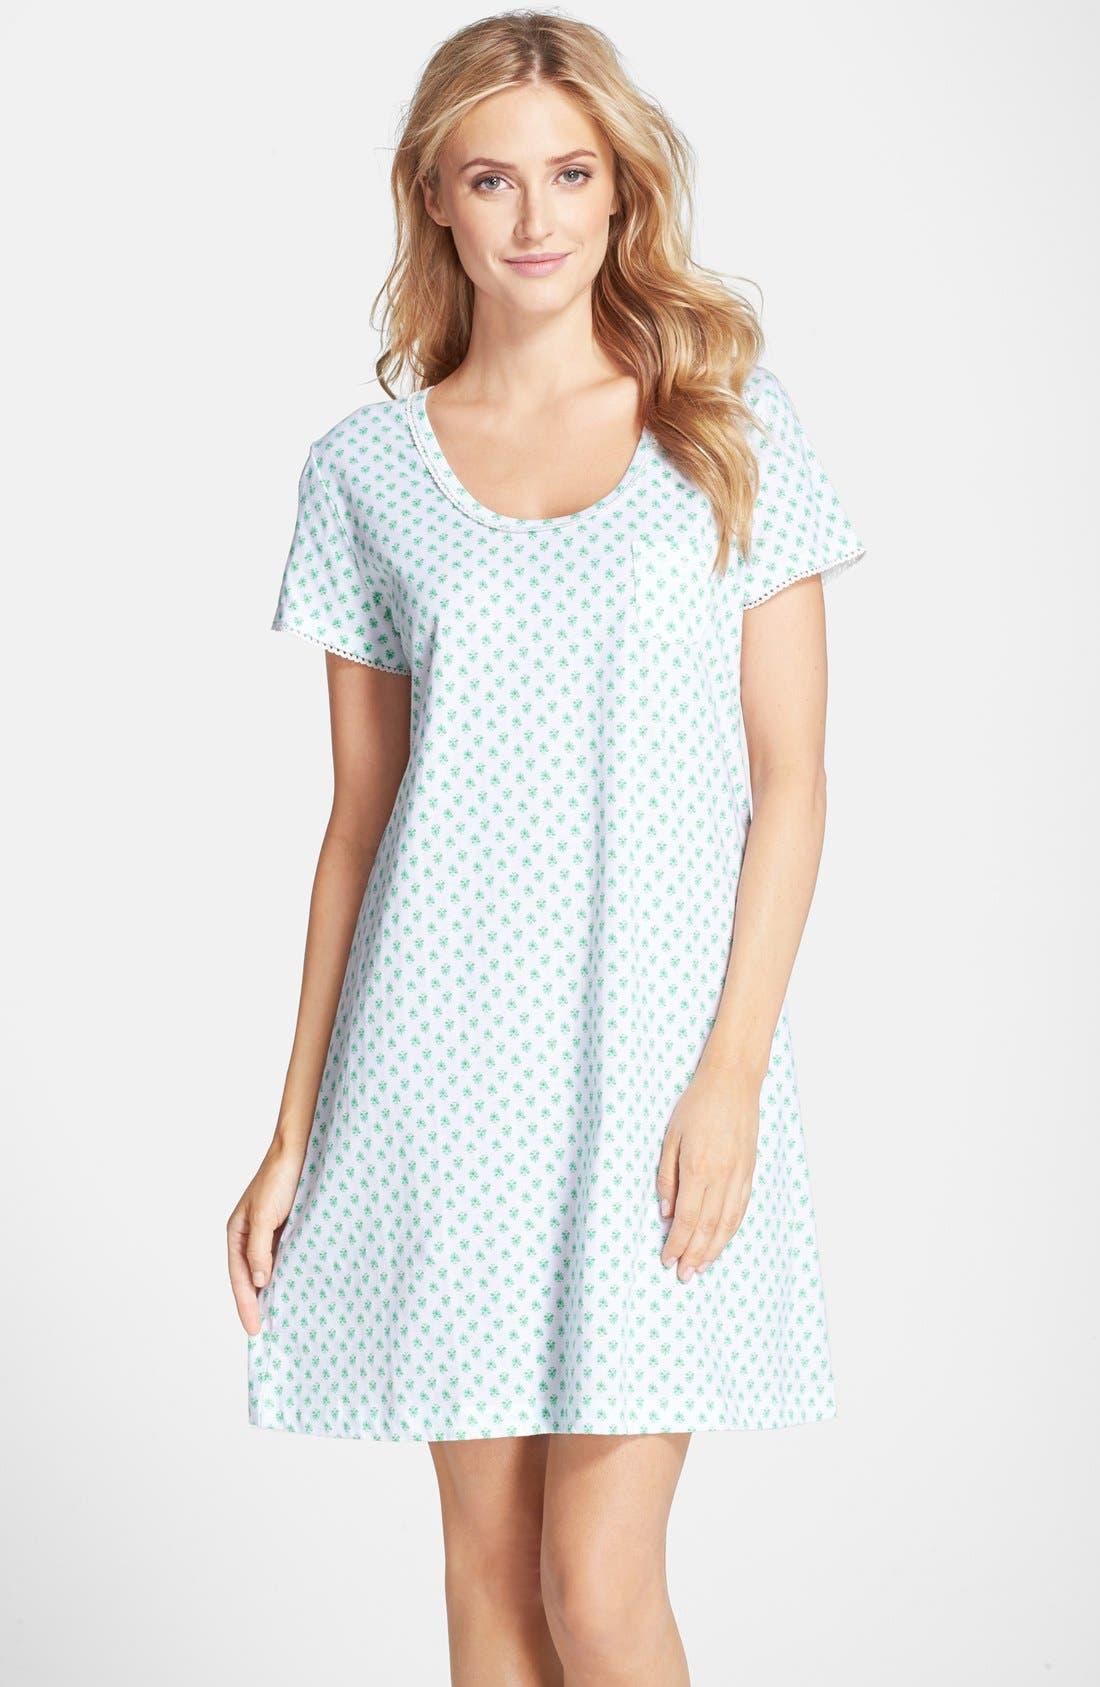 Alternate Image 1 Selected - Carole Hochman Designs Print Cotton Jersey Sleep Shirt